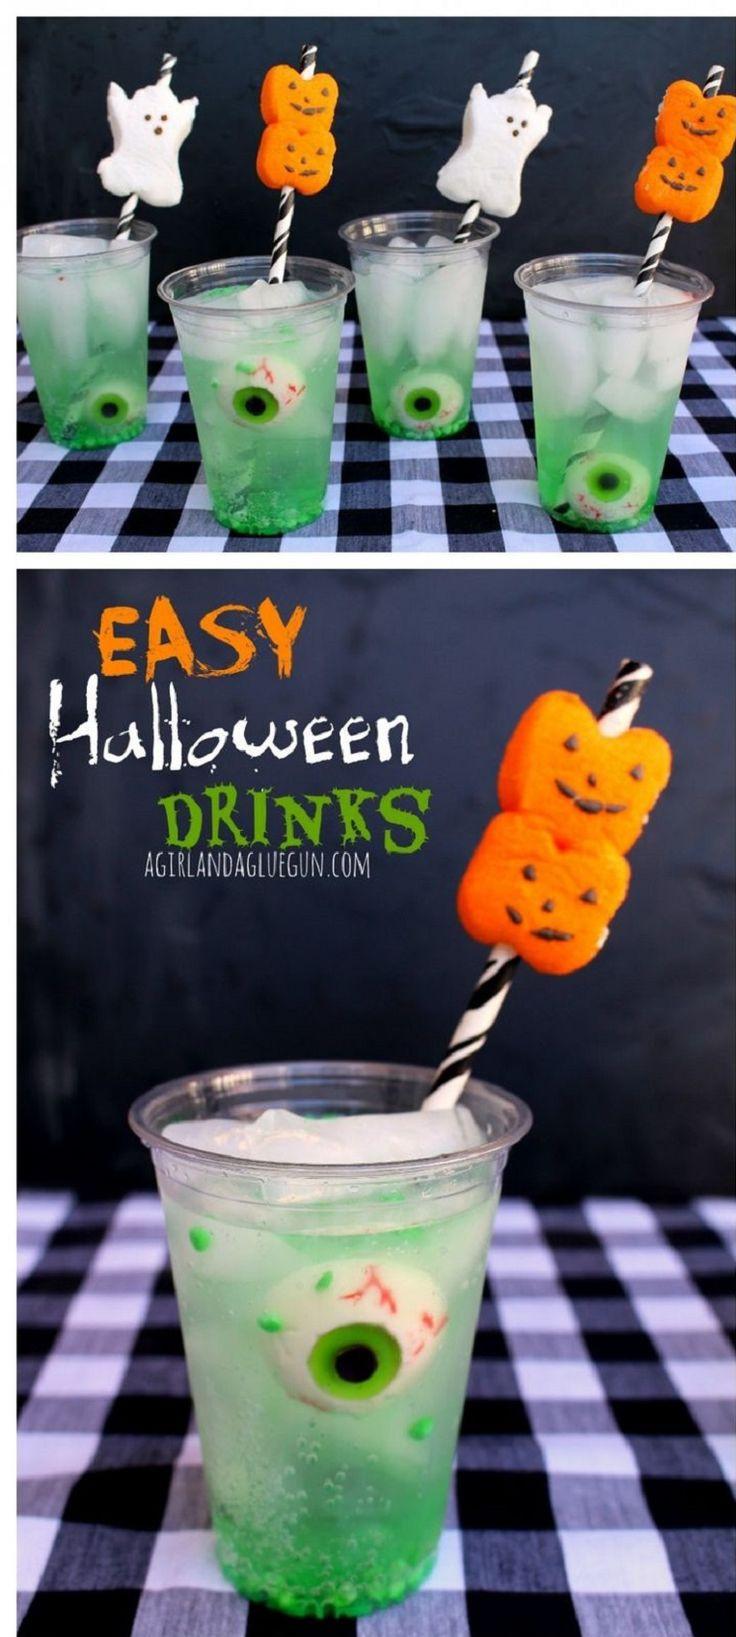 Easy Halloween Drinks  17 Best ideas about Adult Halloween Drinks on Pinterest